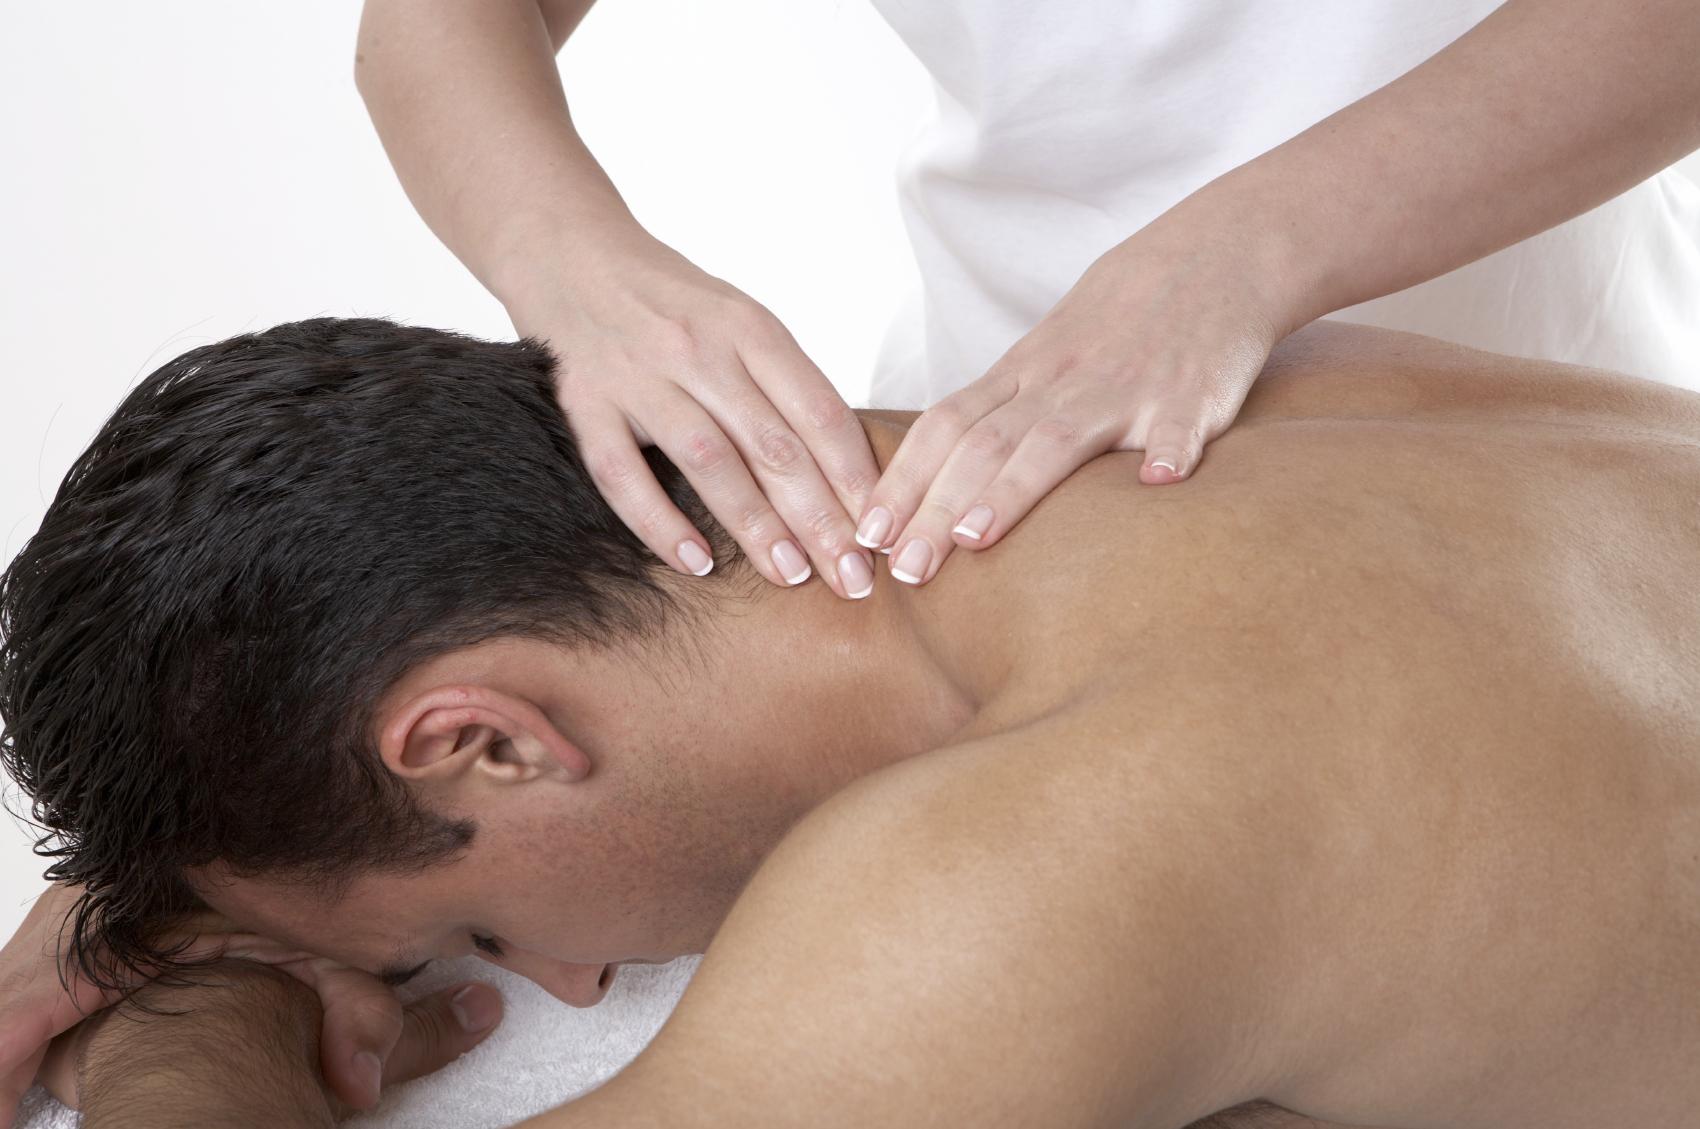 https://i1.wp.com/loosenupbodywork.com/wp-content/uploads/2011/09/man-massage.jpg